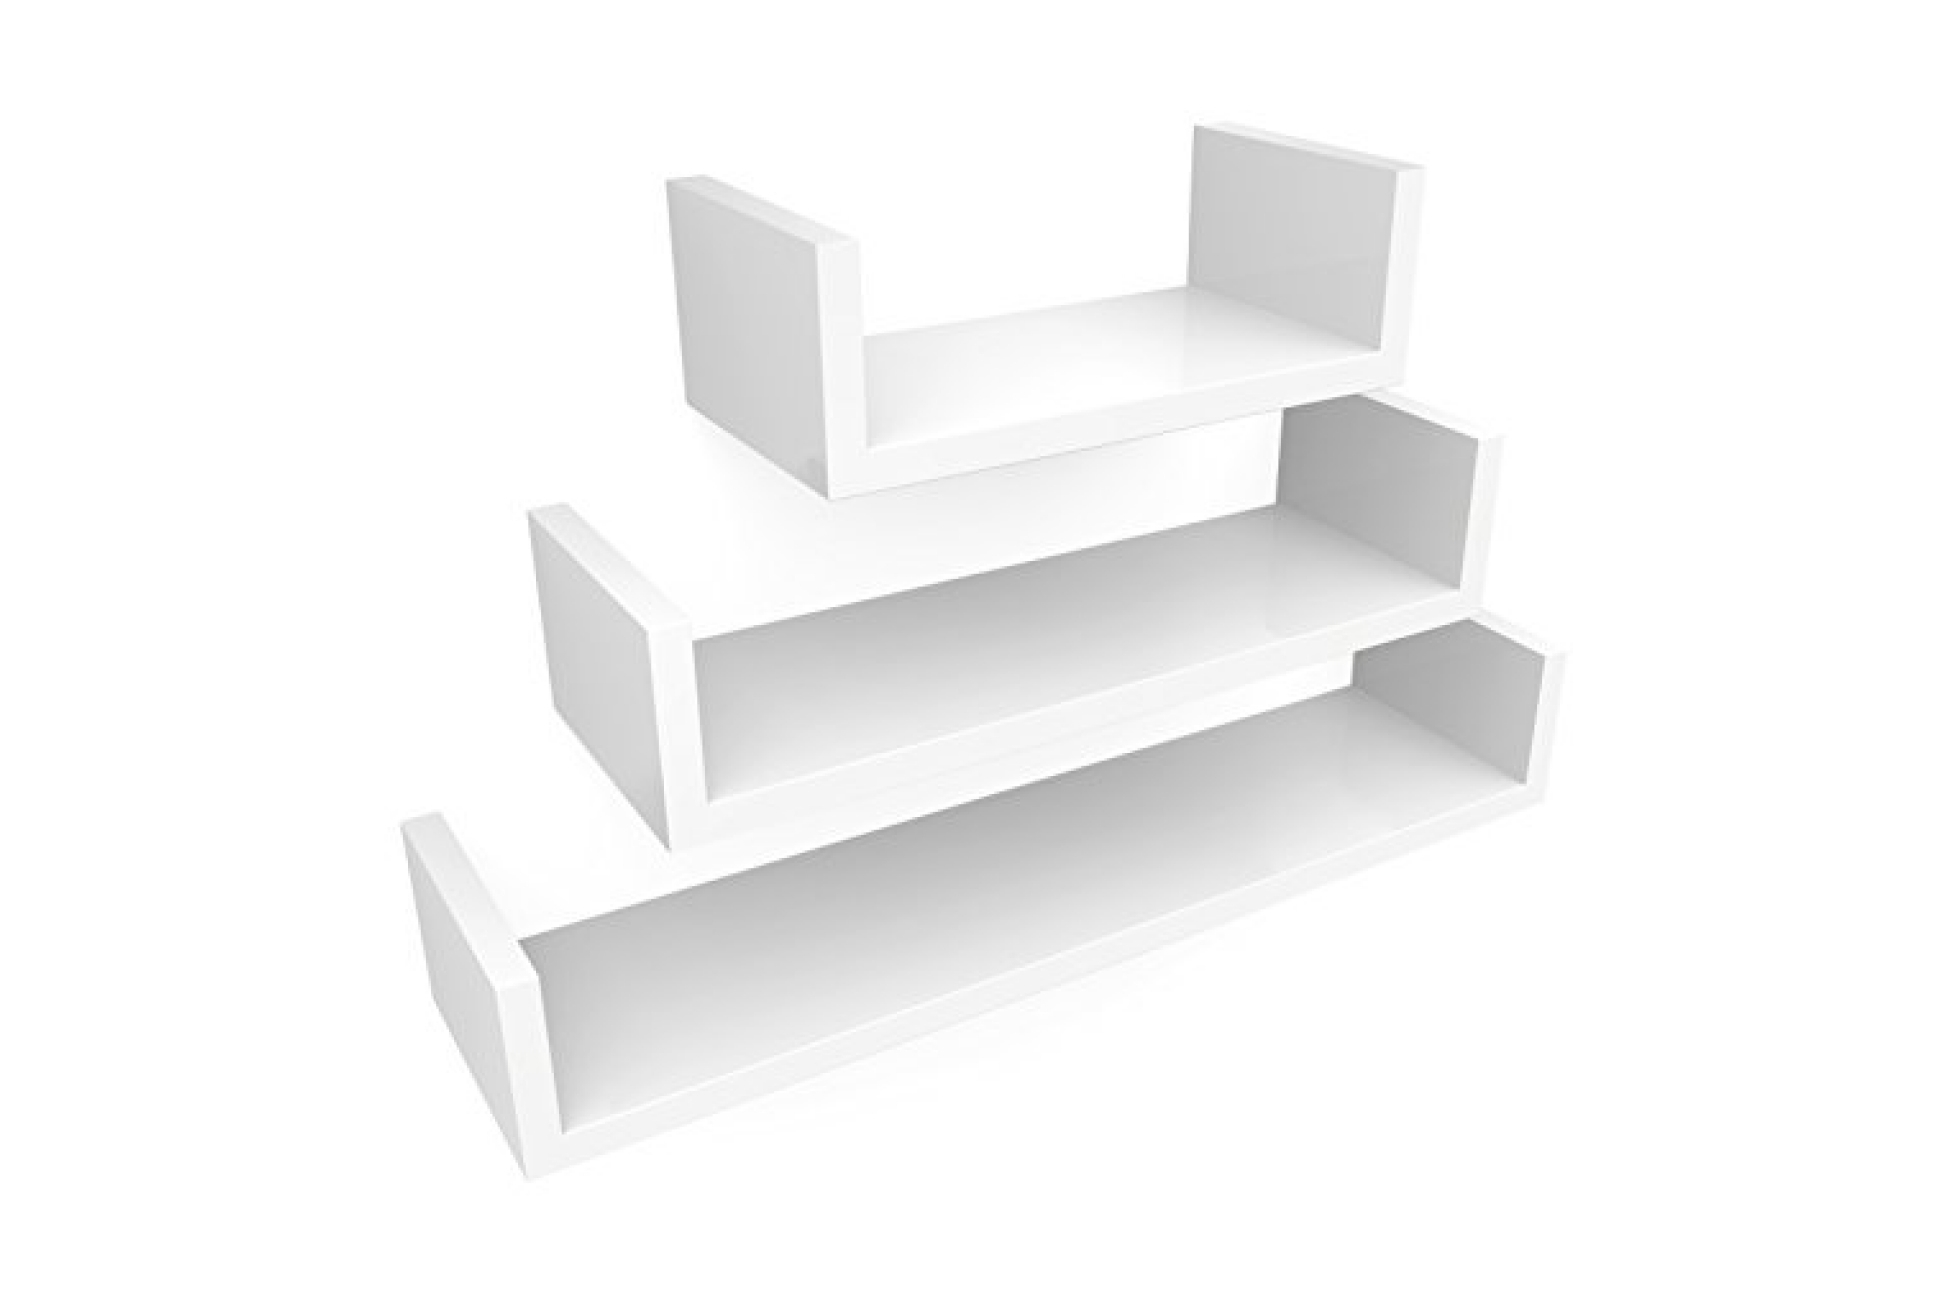 schweberegal test 2017 top 7 schweberegale expertesto. Black Bedroom Furniture Sets. Home Design Ideas